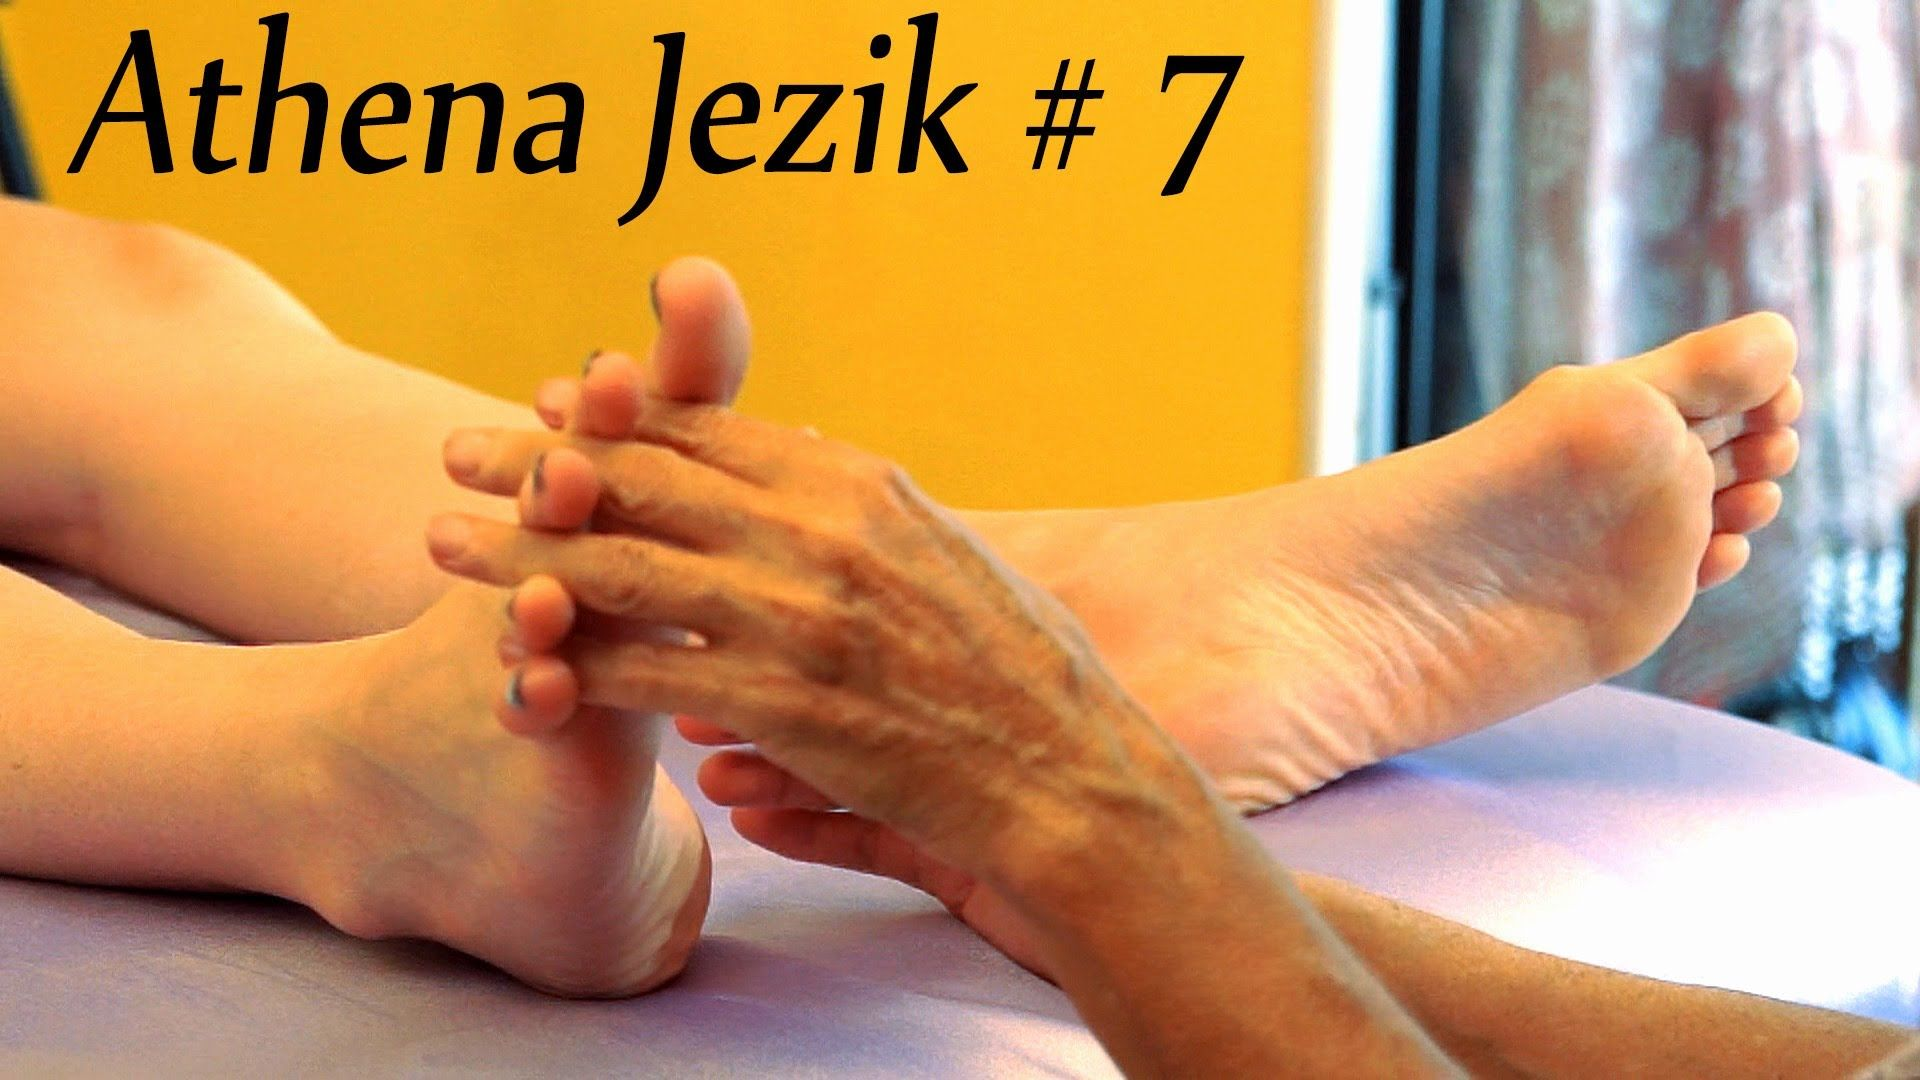 Relaxing Asmr Foot Massage Athena Jezik 7 How To